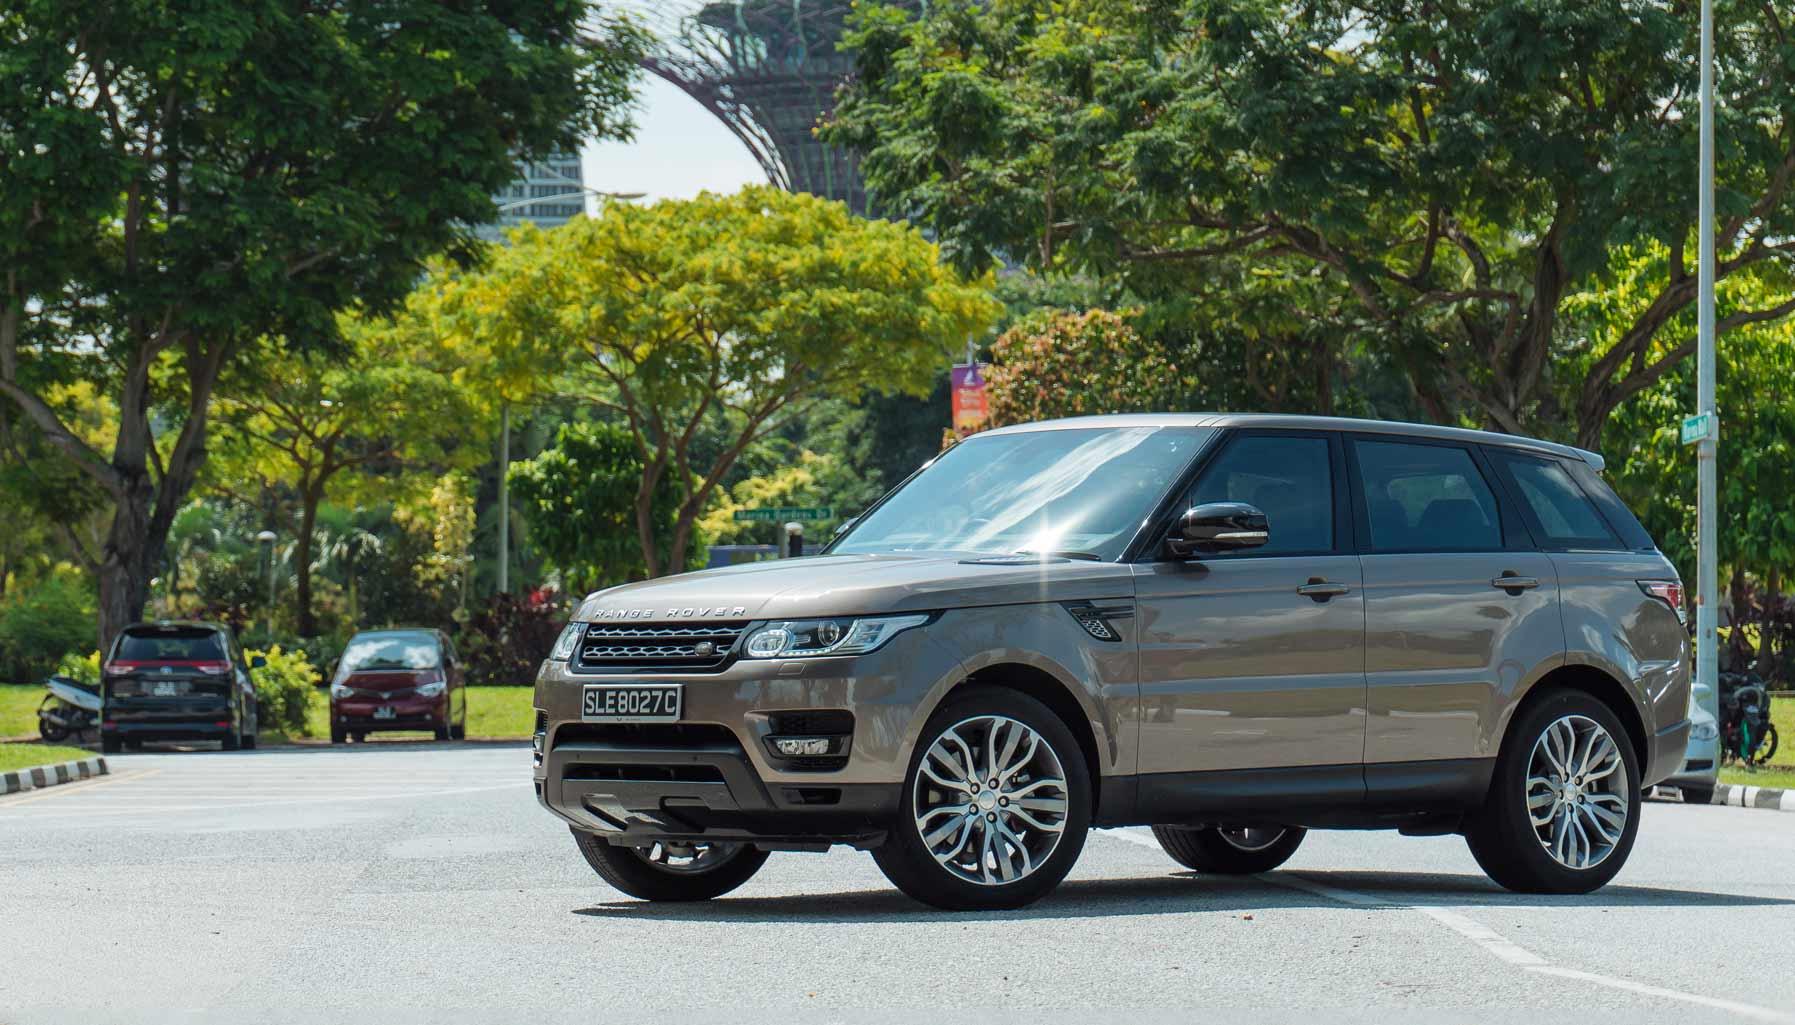 COTY 2016 contender: Range Rover Sport